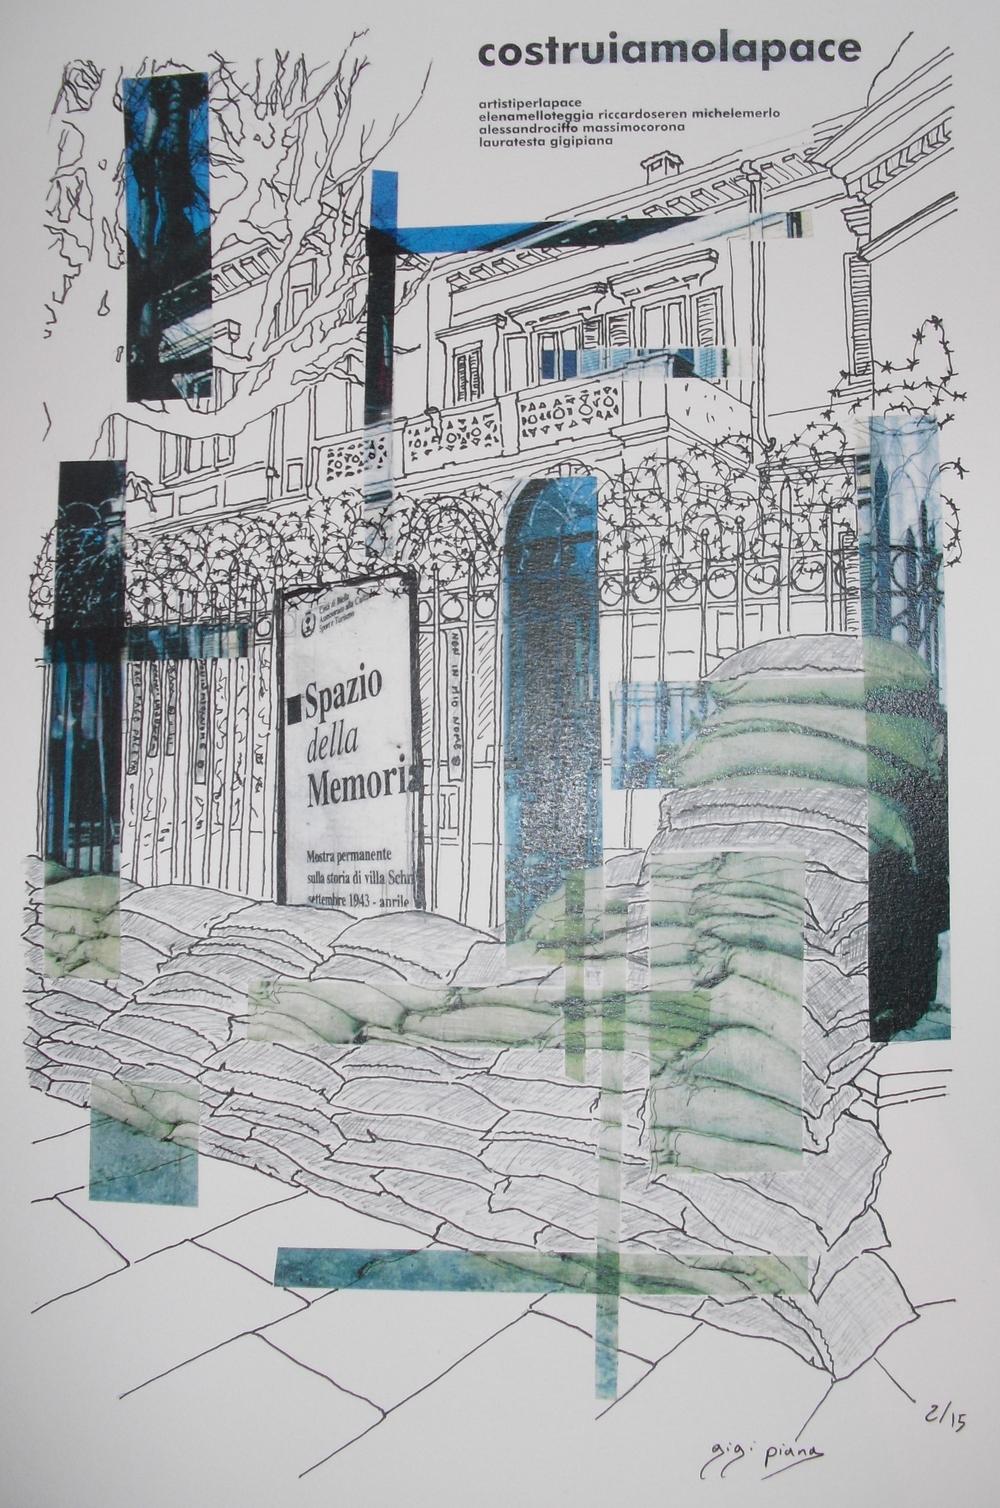 Gigi Piana costruiamolapace  (2012) stampa digitale 50 x 40 cm edizione di 20